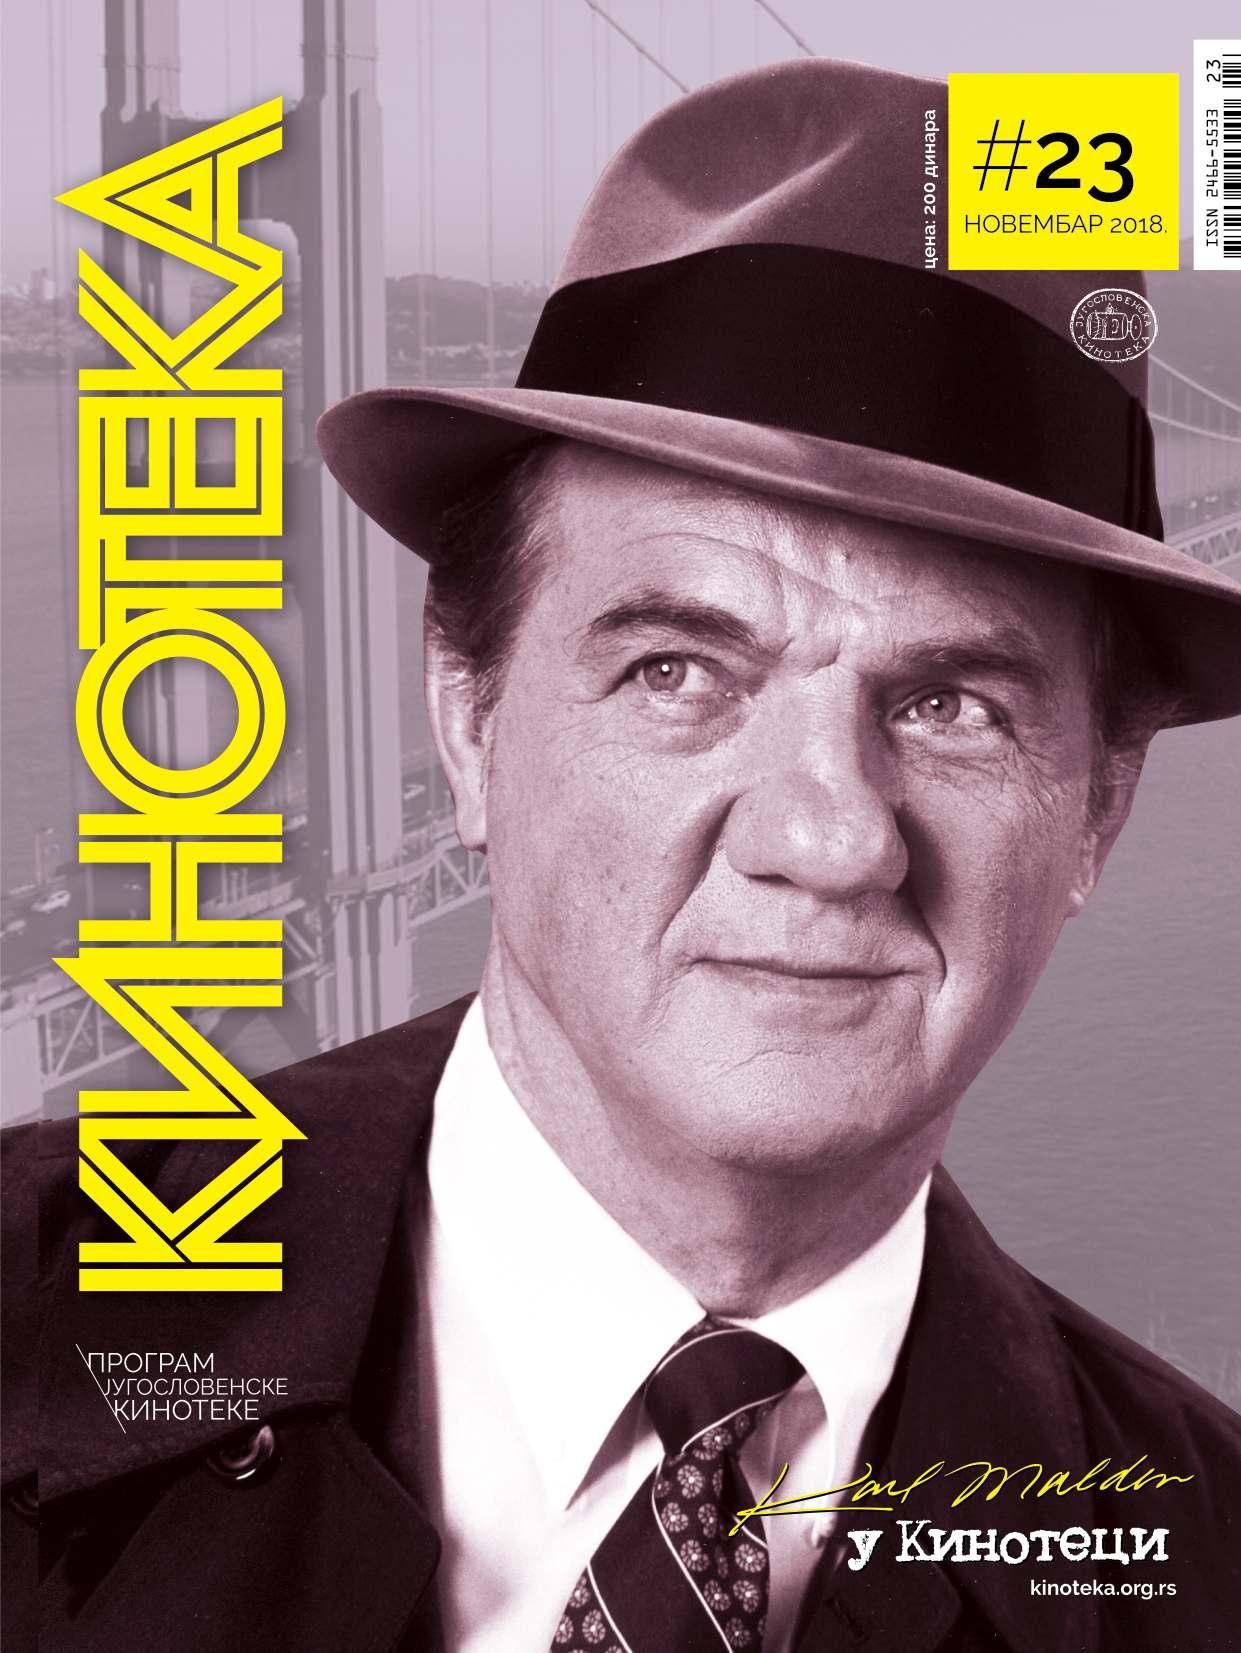 NOVEMBAR_018_KINOTEKA_korice-01